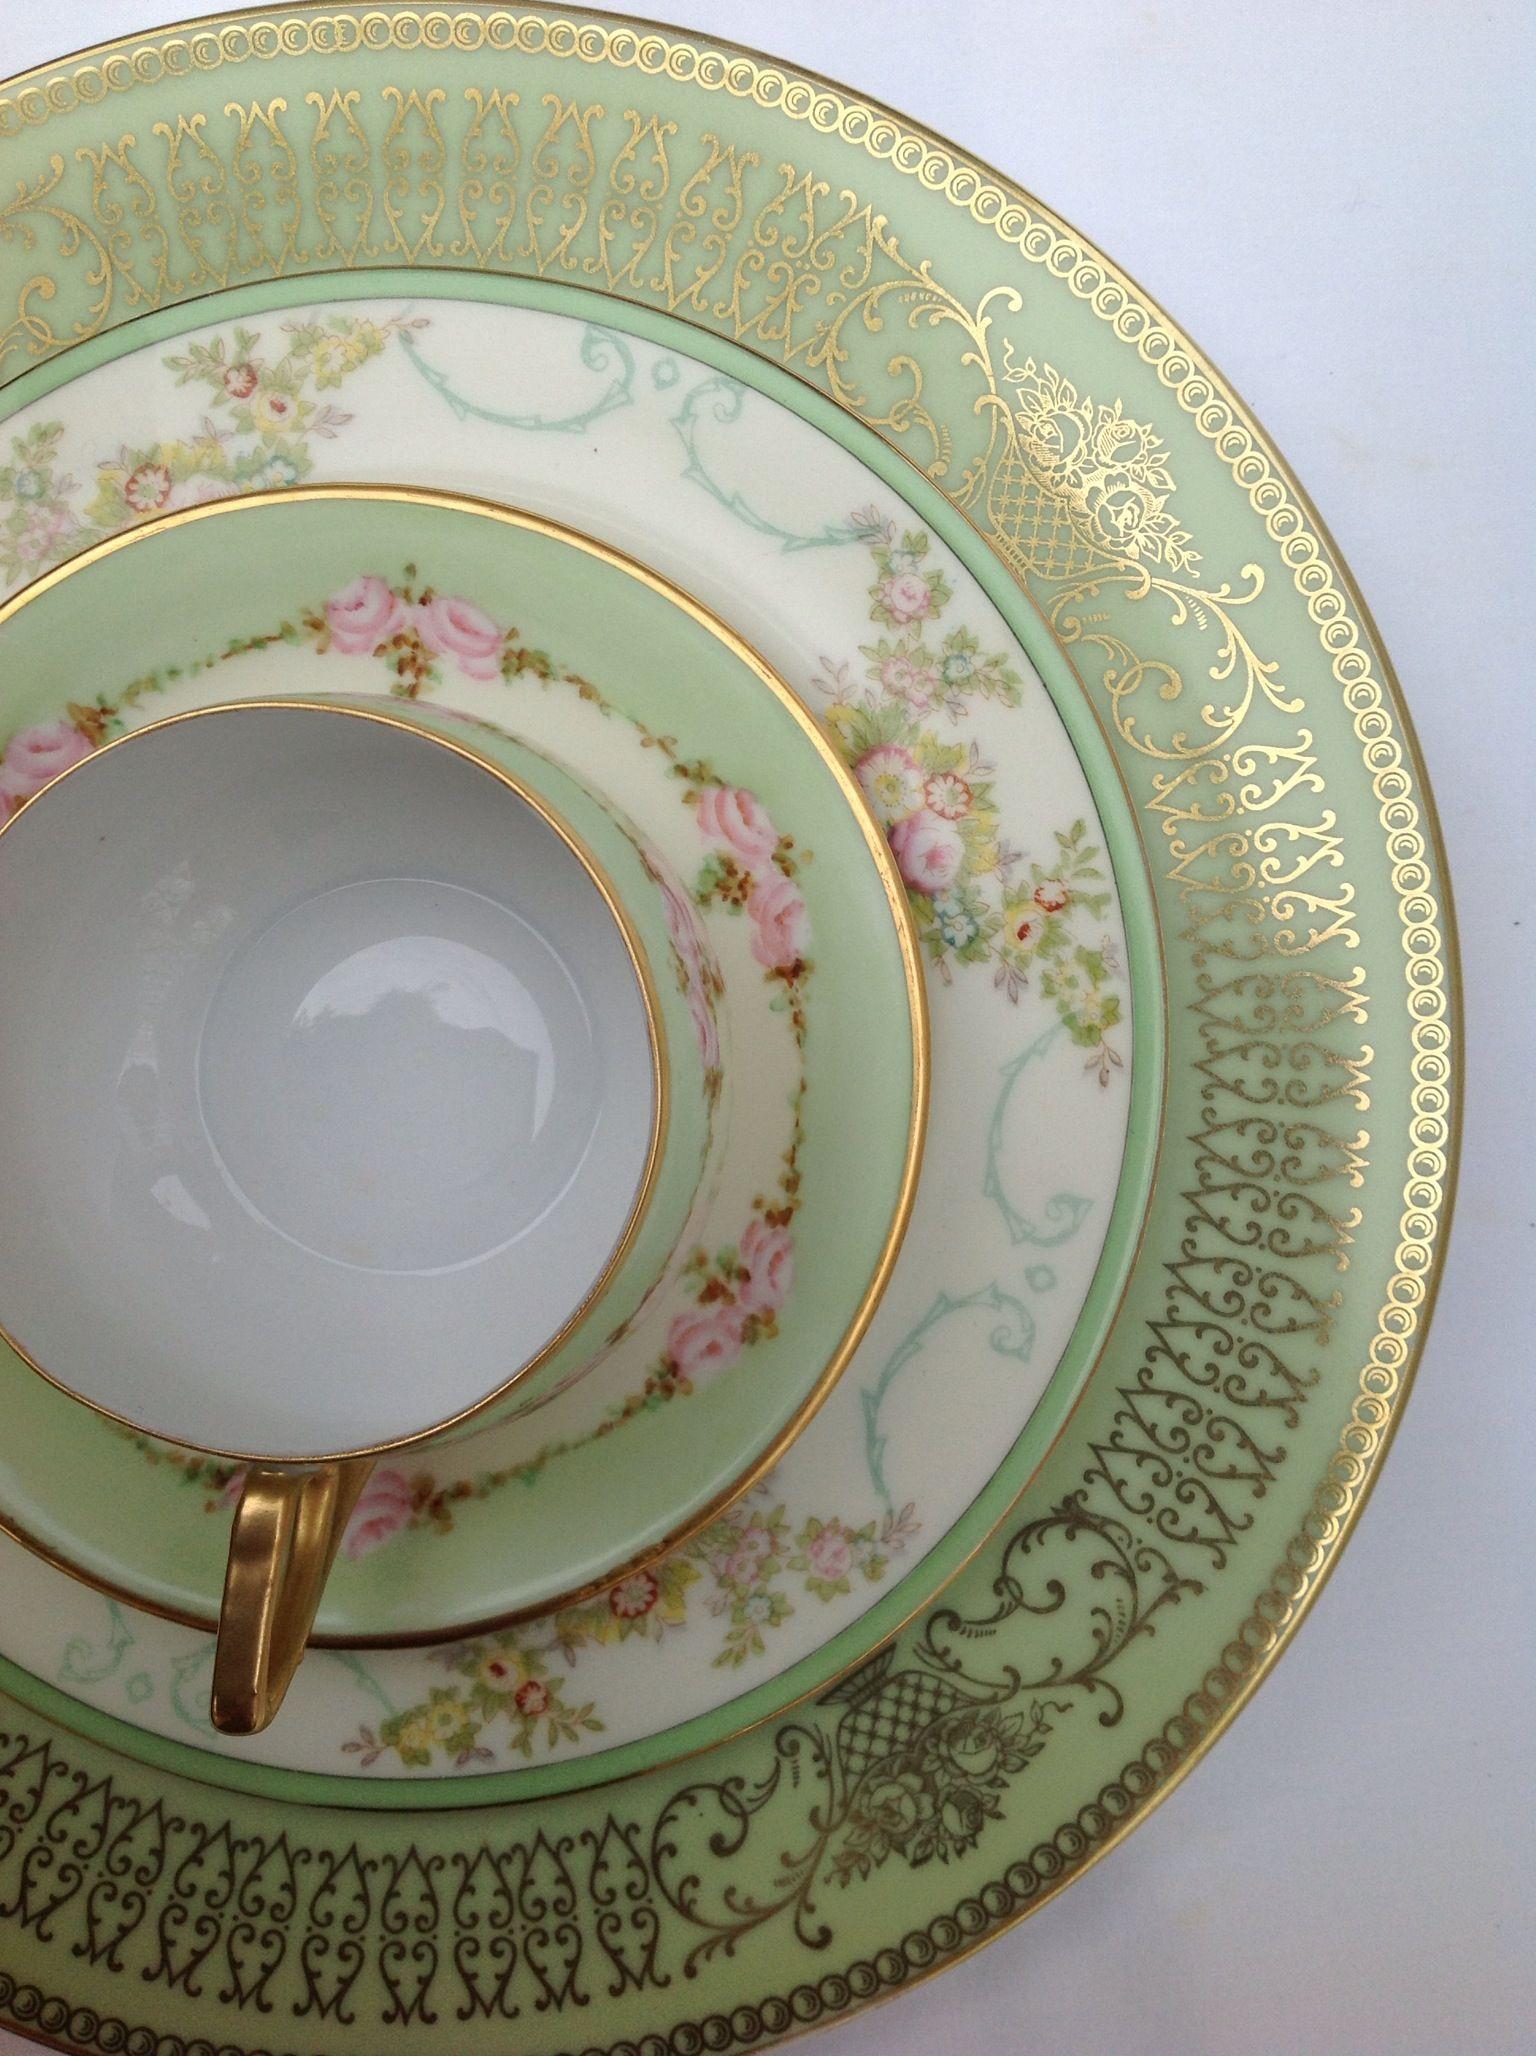 Vintage KPM teacup Meito China Tirschenreuth botanical floral plate